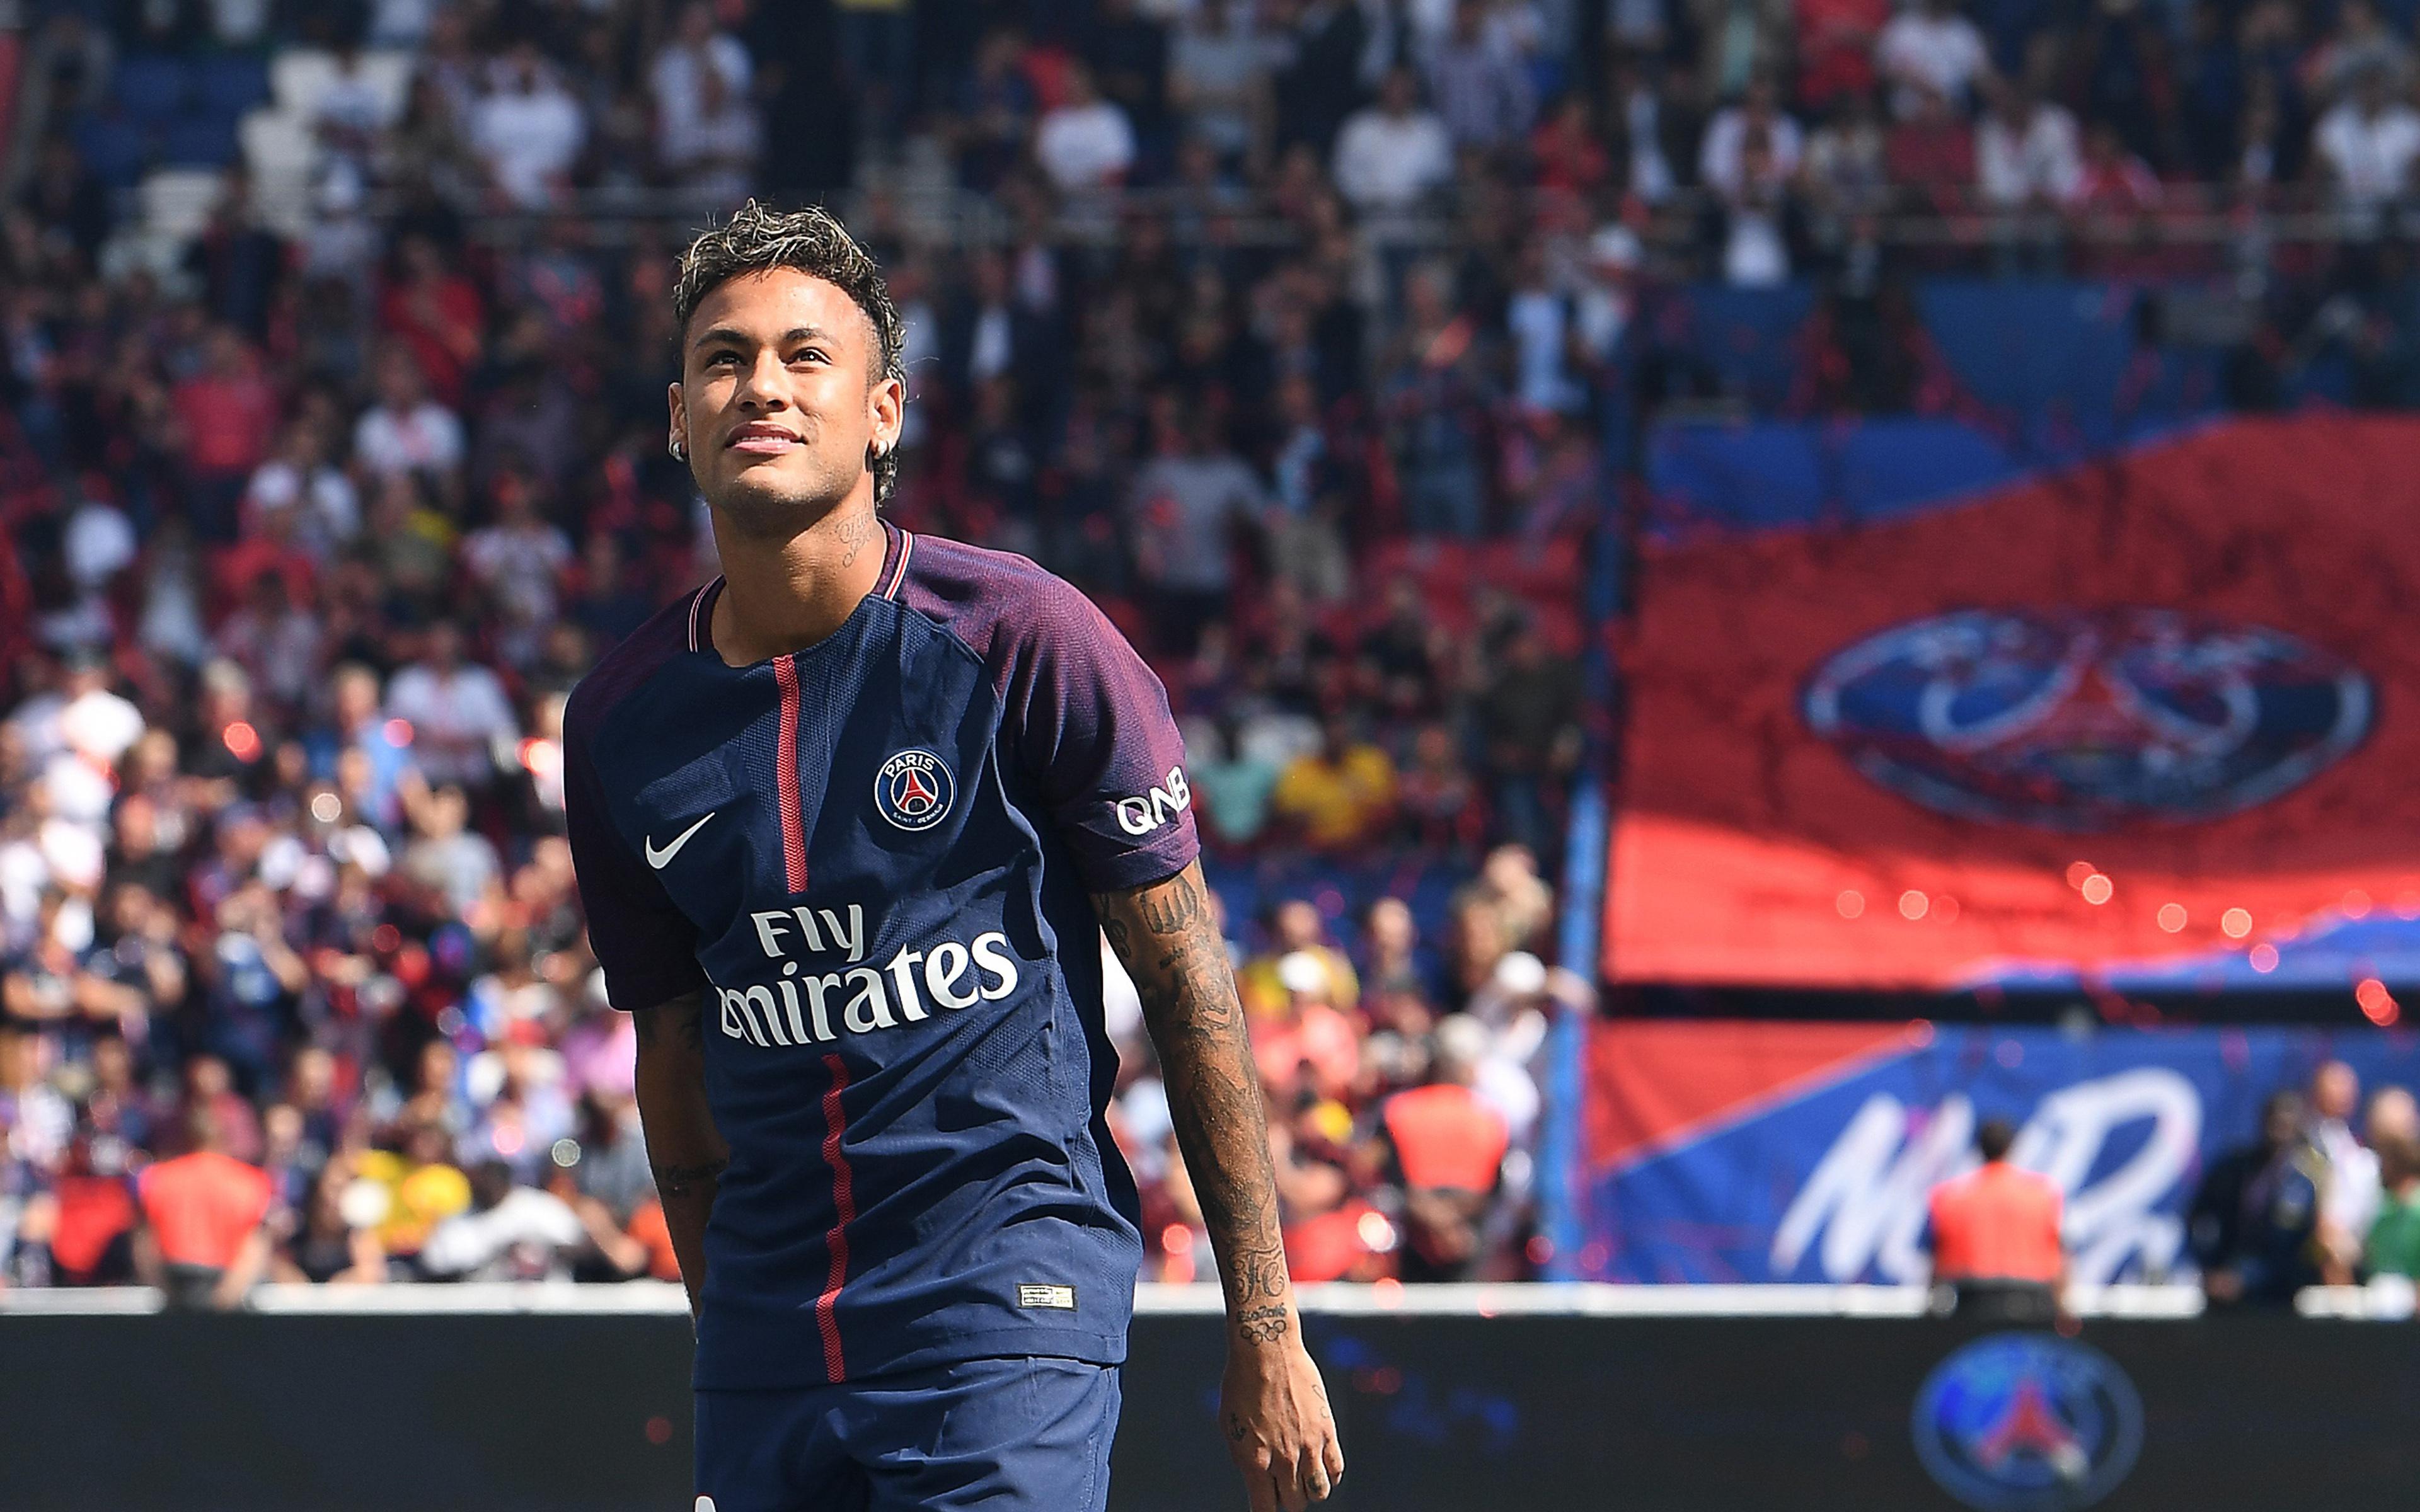 Neymar PSG Wallpaper, HD Sports 4K Wallpapers, Images ...